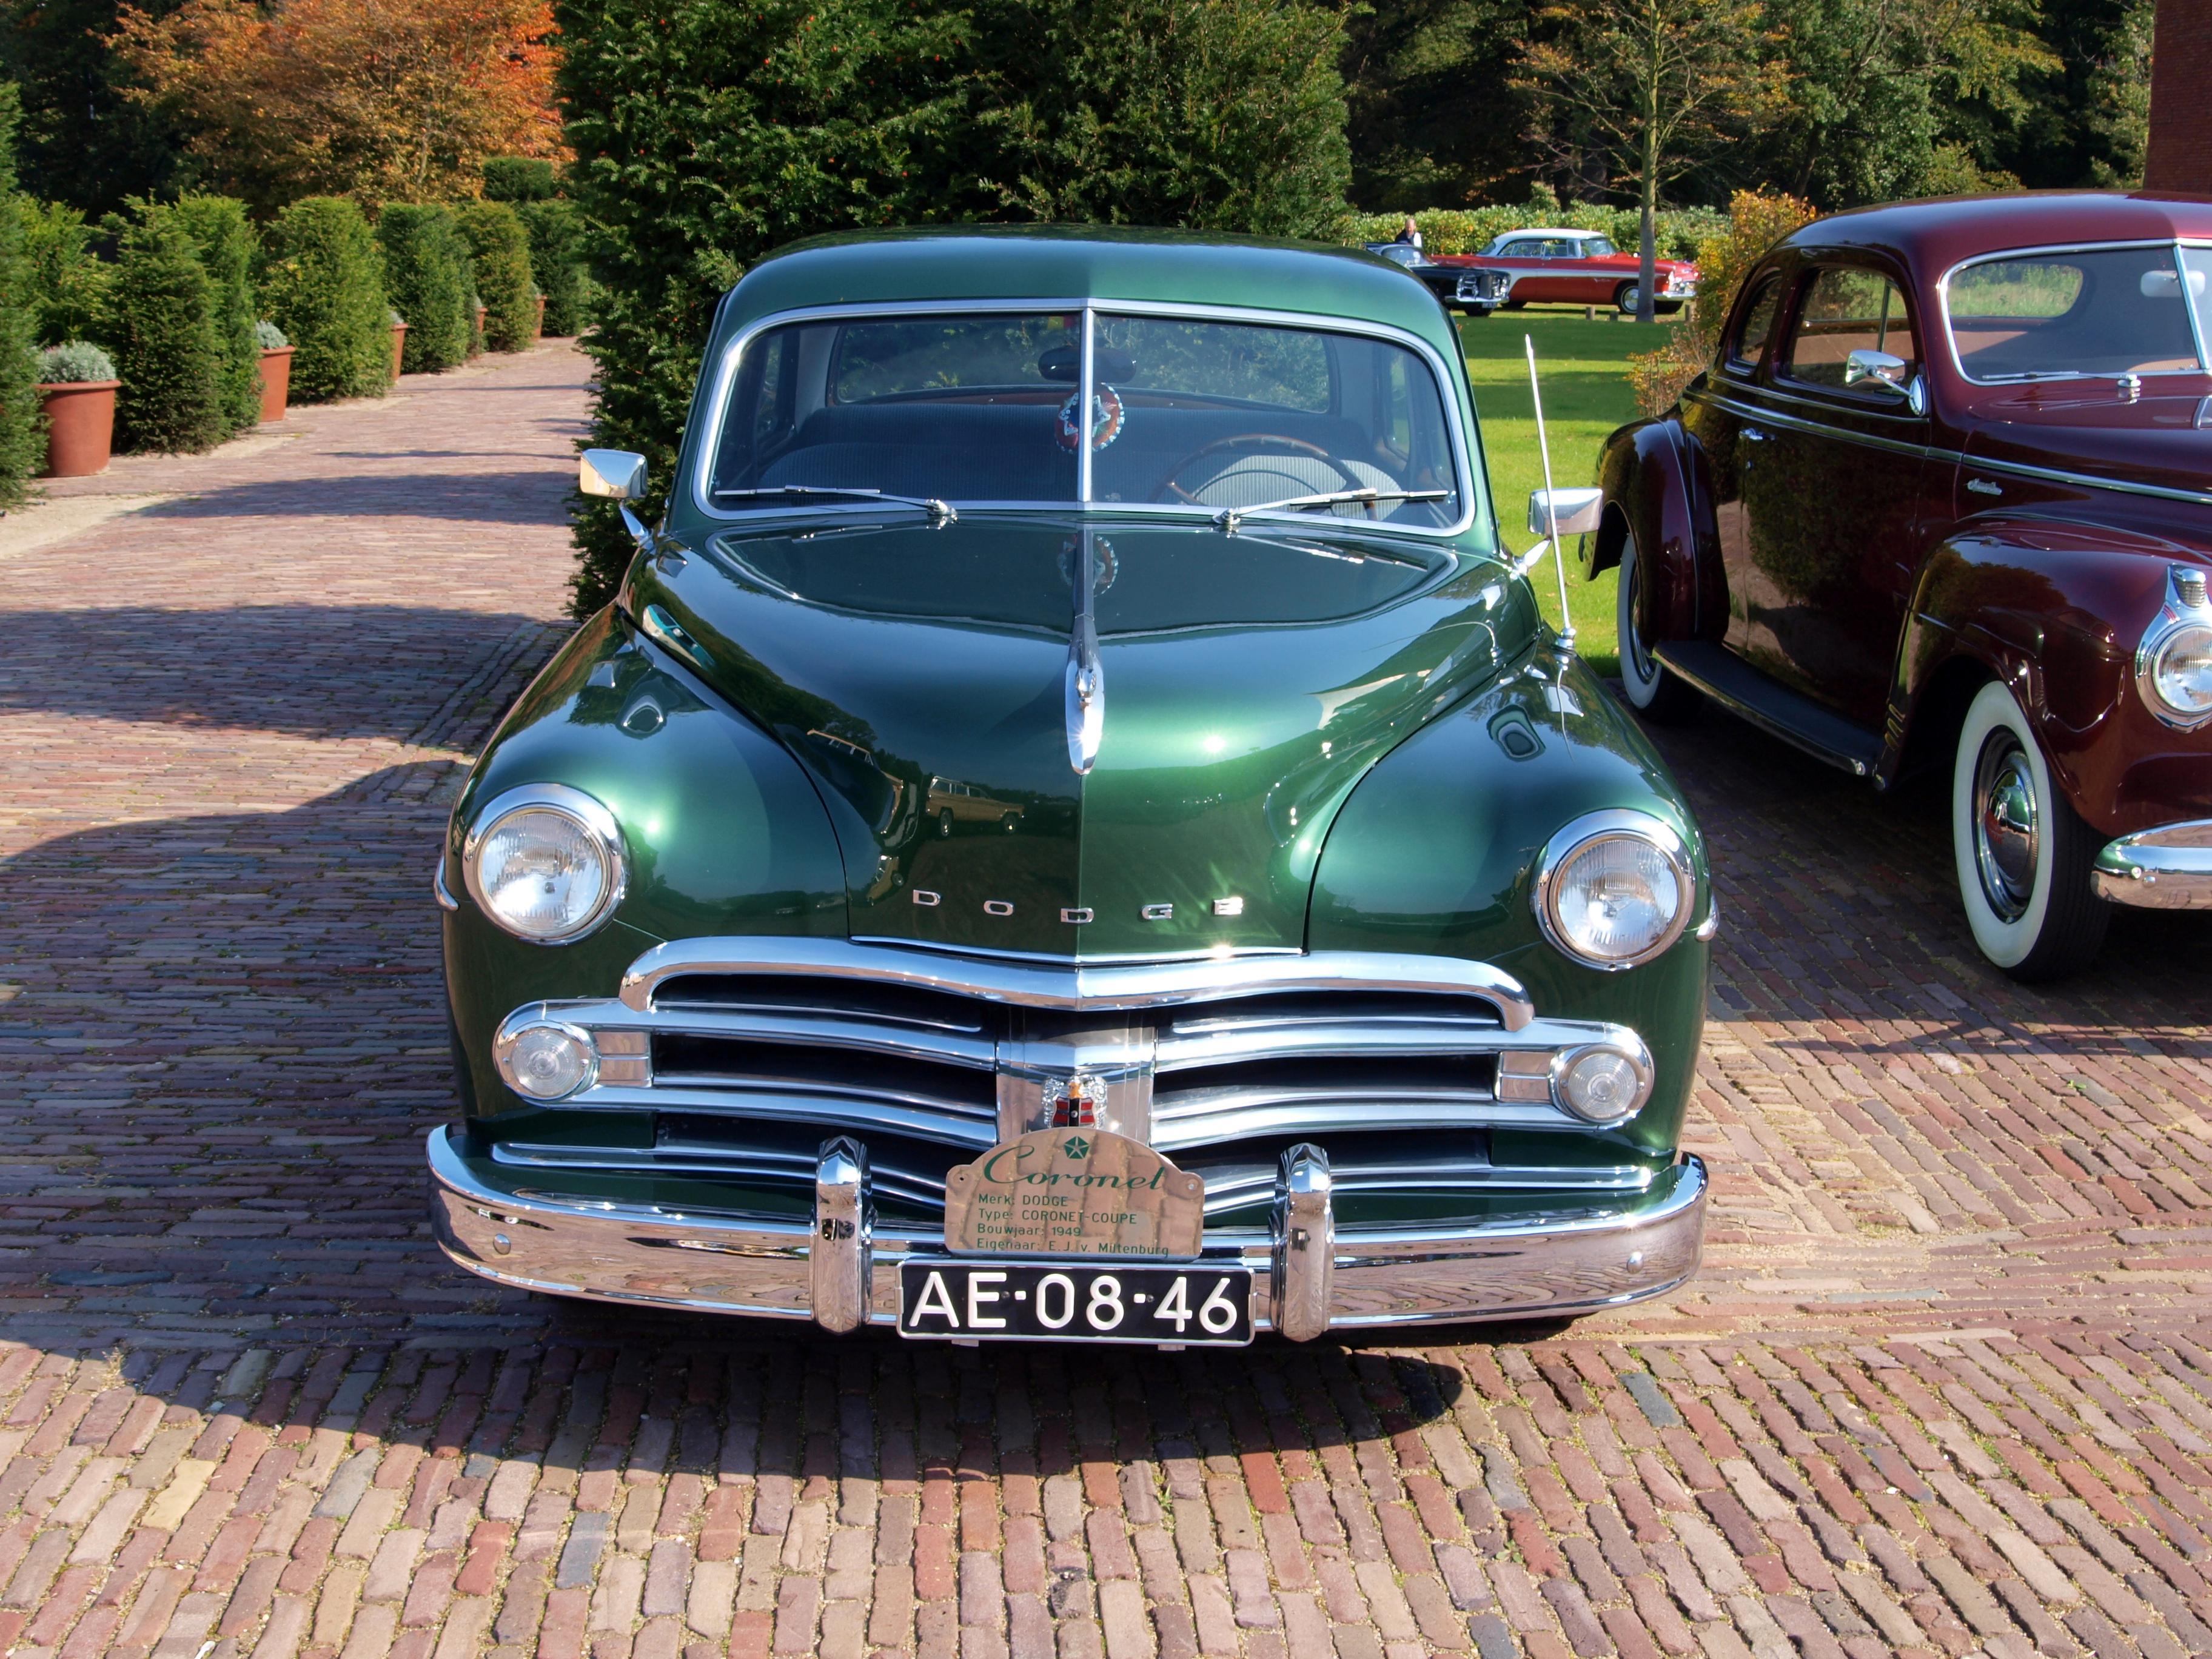 File:1950 Dodge Coronet photo-3.JPG - Wikimedia Commons